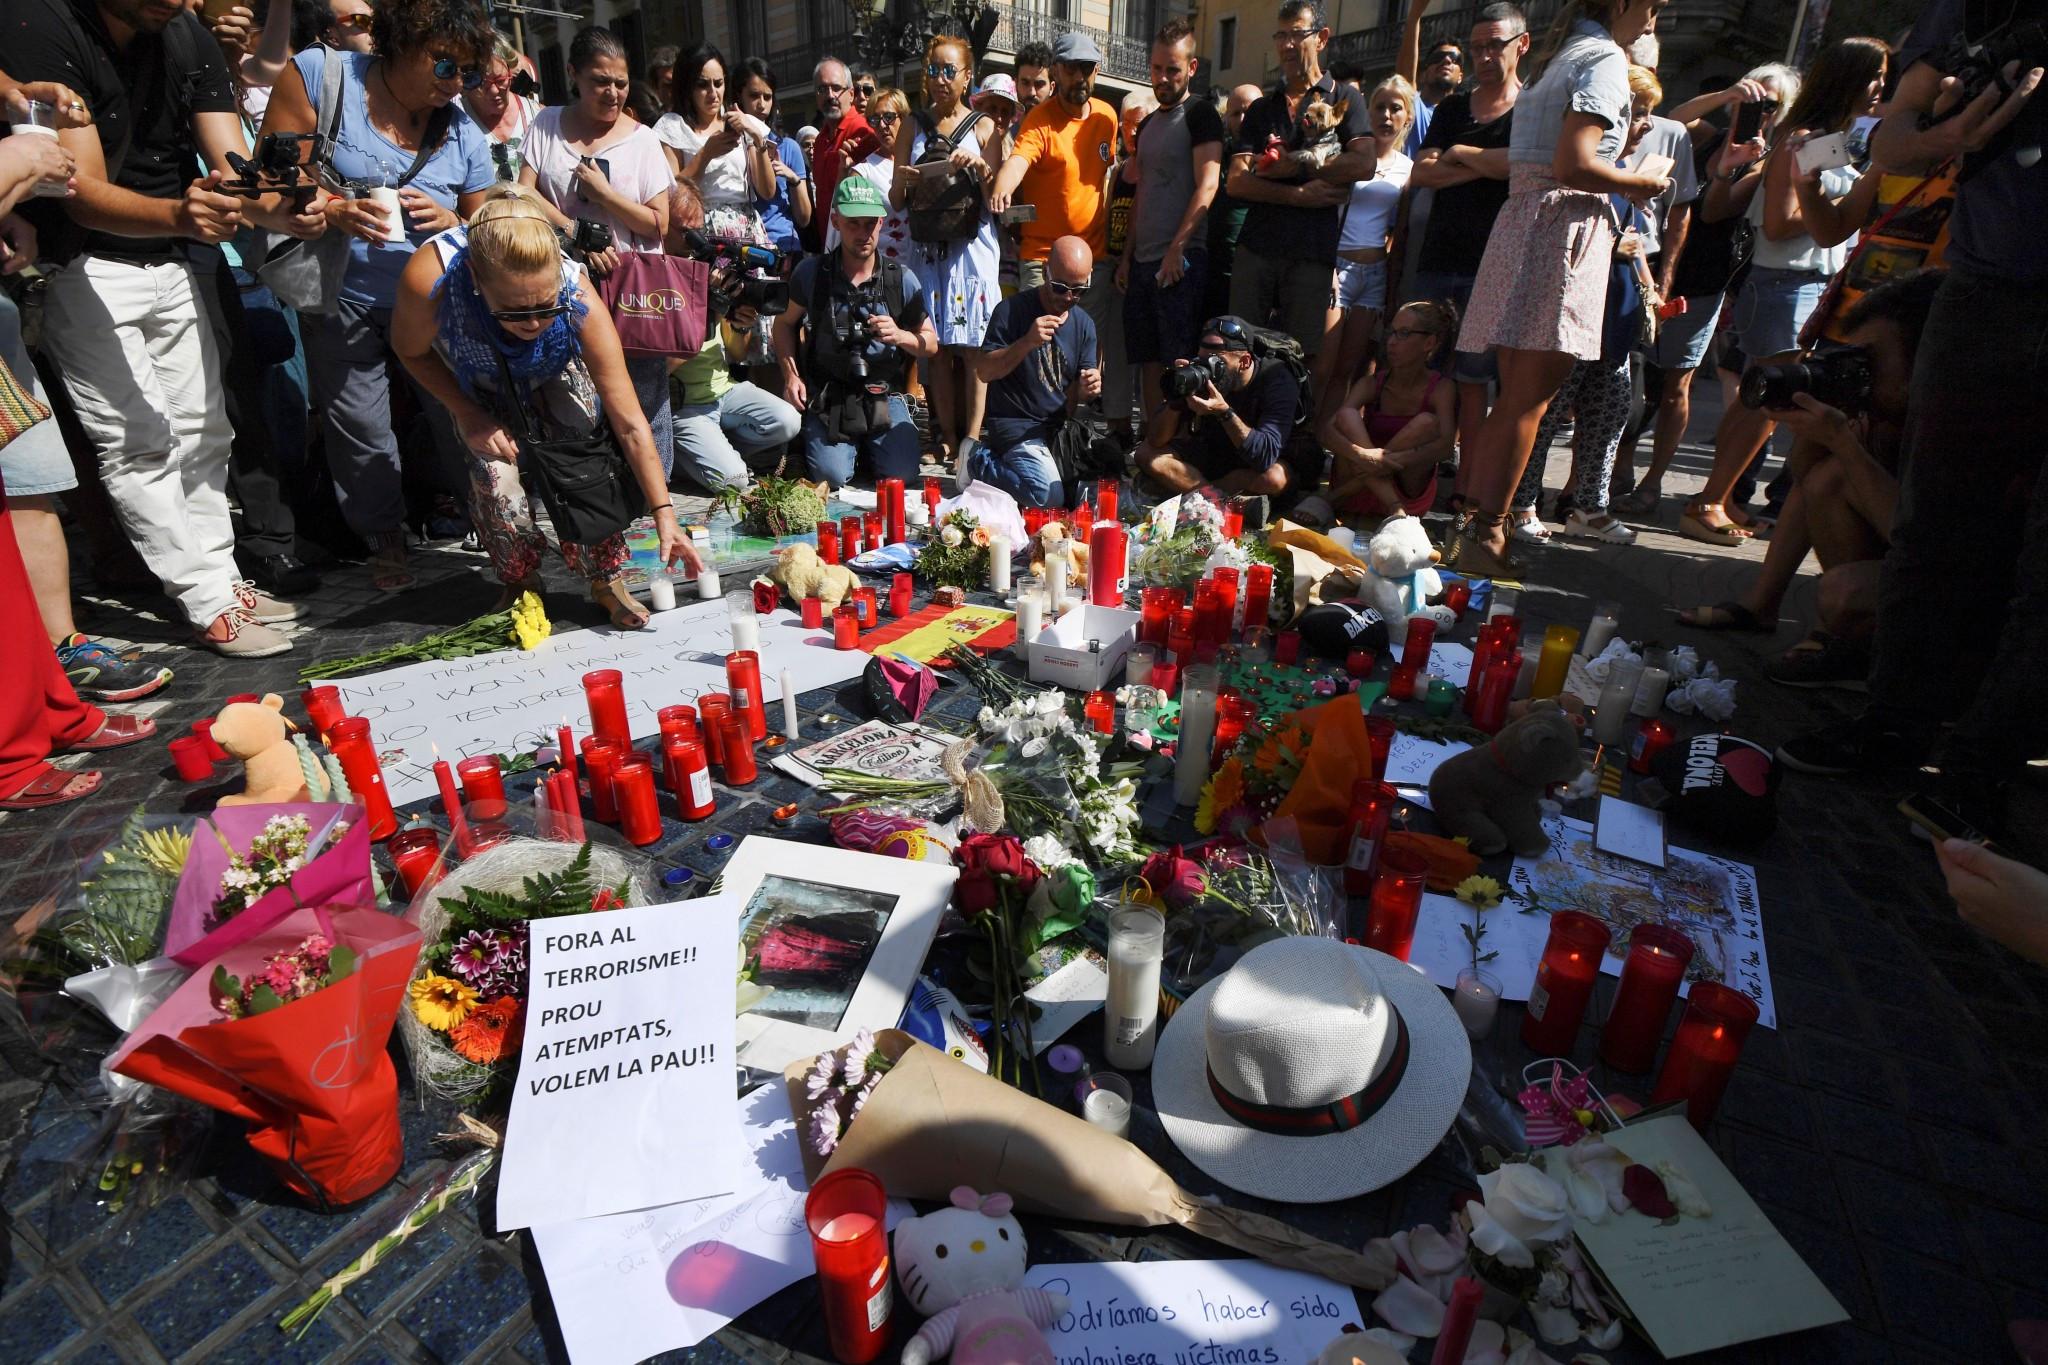 Bach says IOC condemn terrorists attacks in Spain